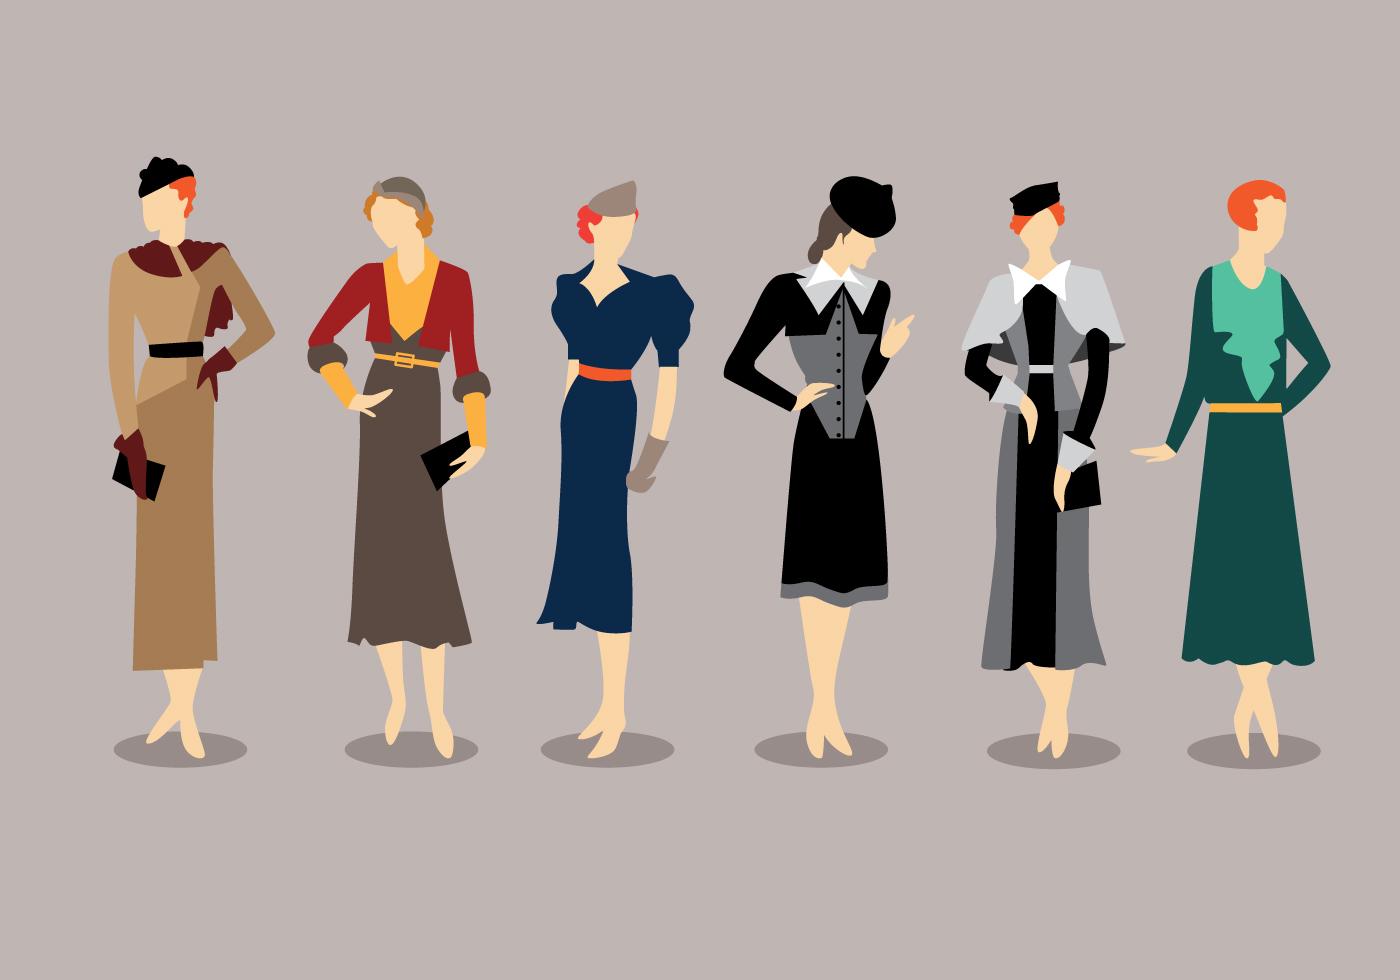 Fashion Style 1930s Vectors